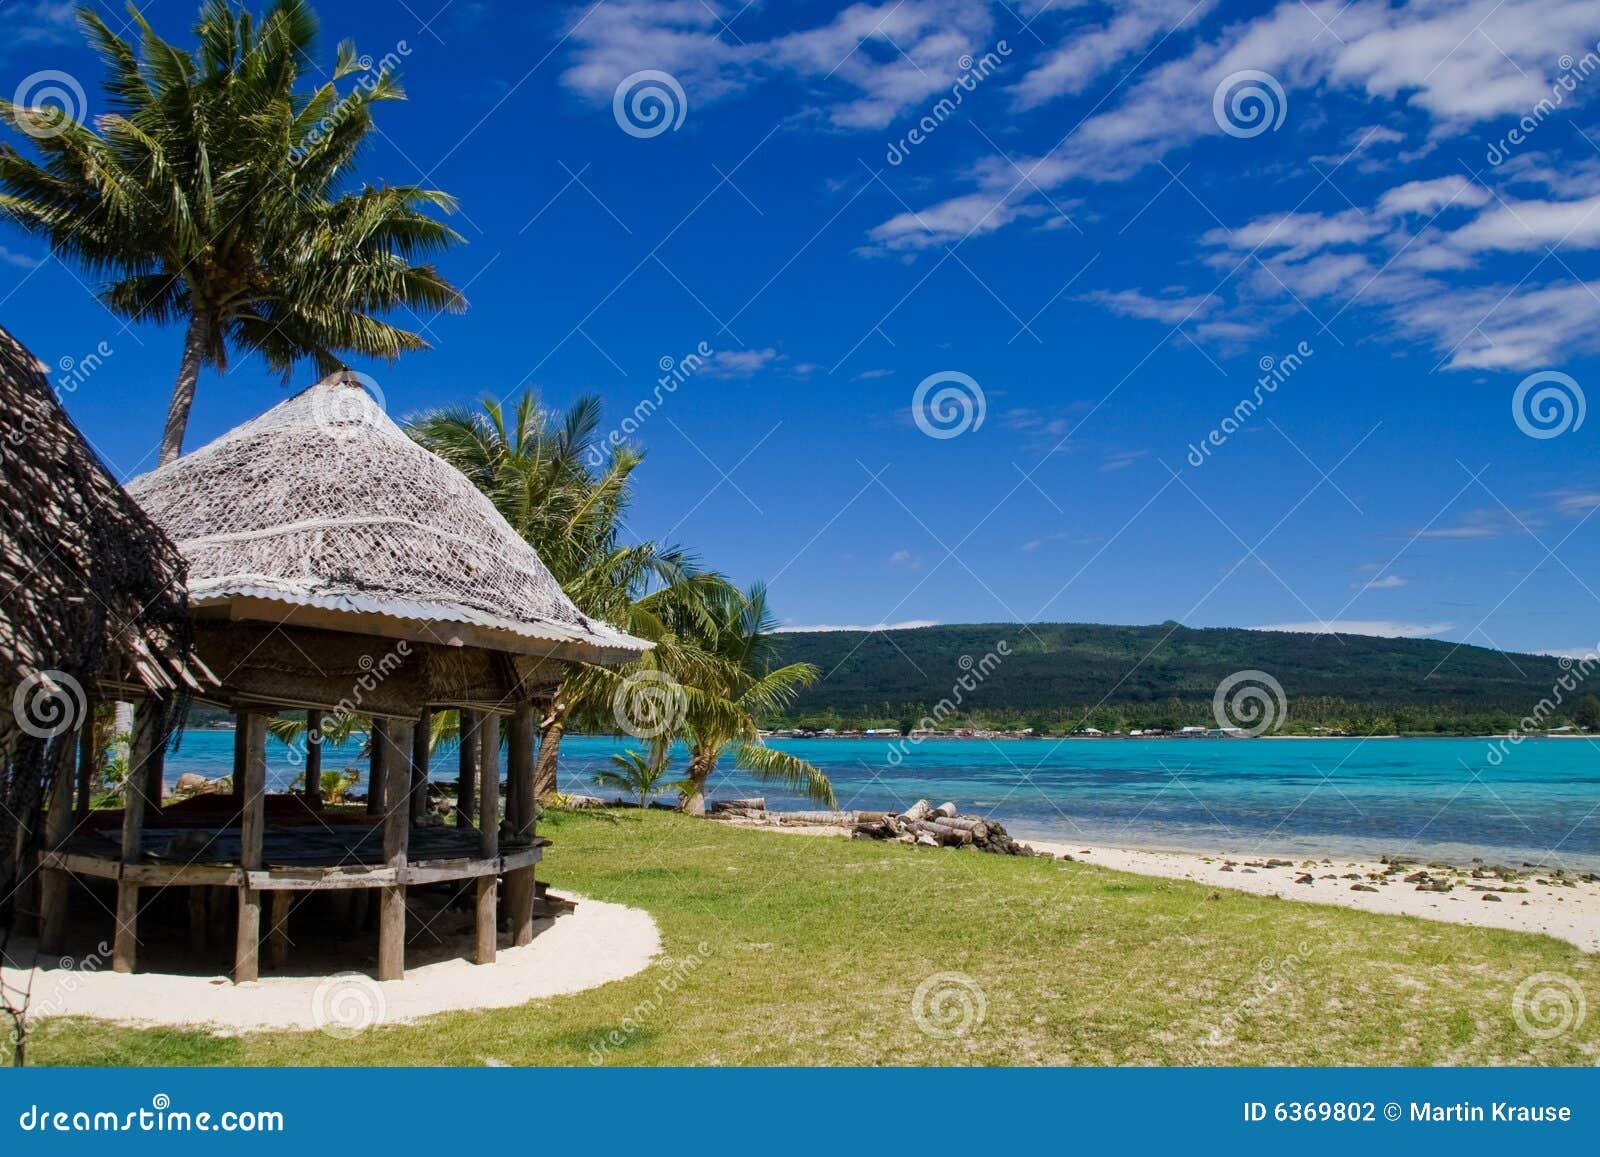 Tropical Beach Huts: Tropical Beach Hut Stock Photography